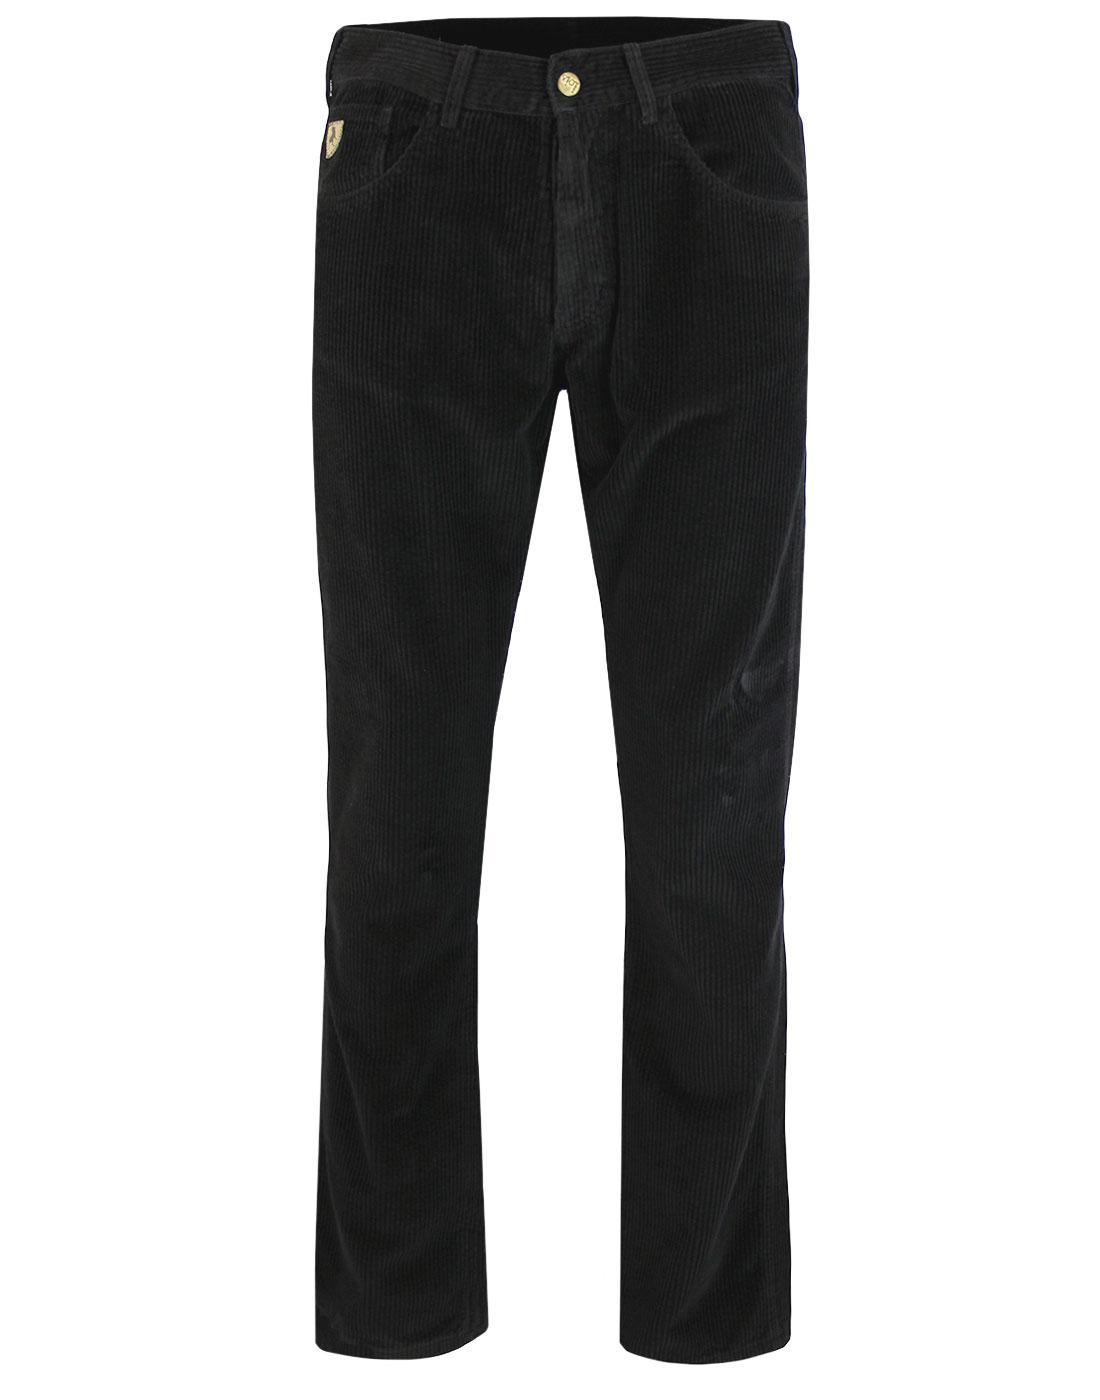 New Dallas LOIS 1980s Mod Jumbo Cord Trousers (B)